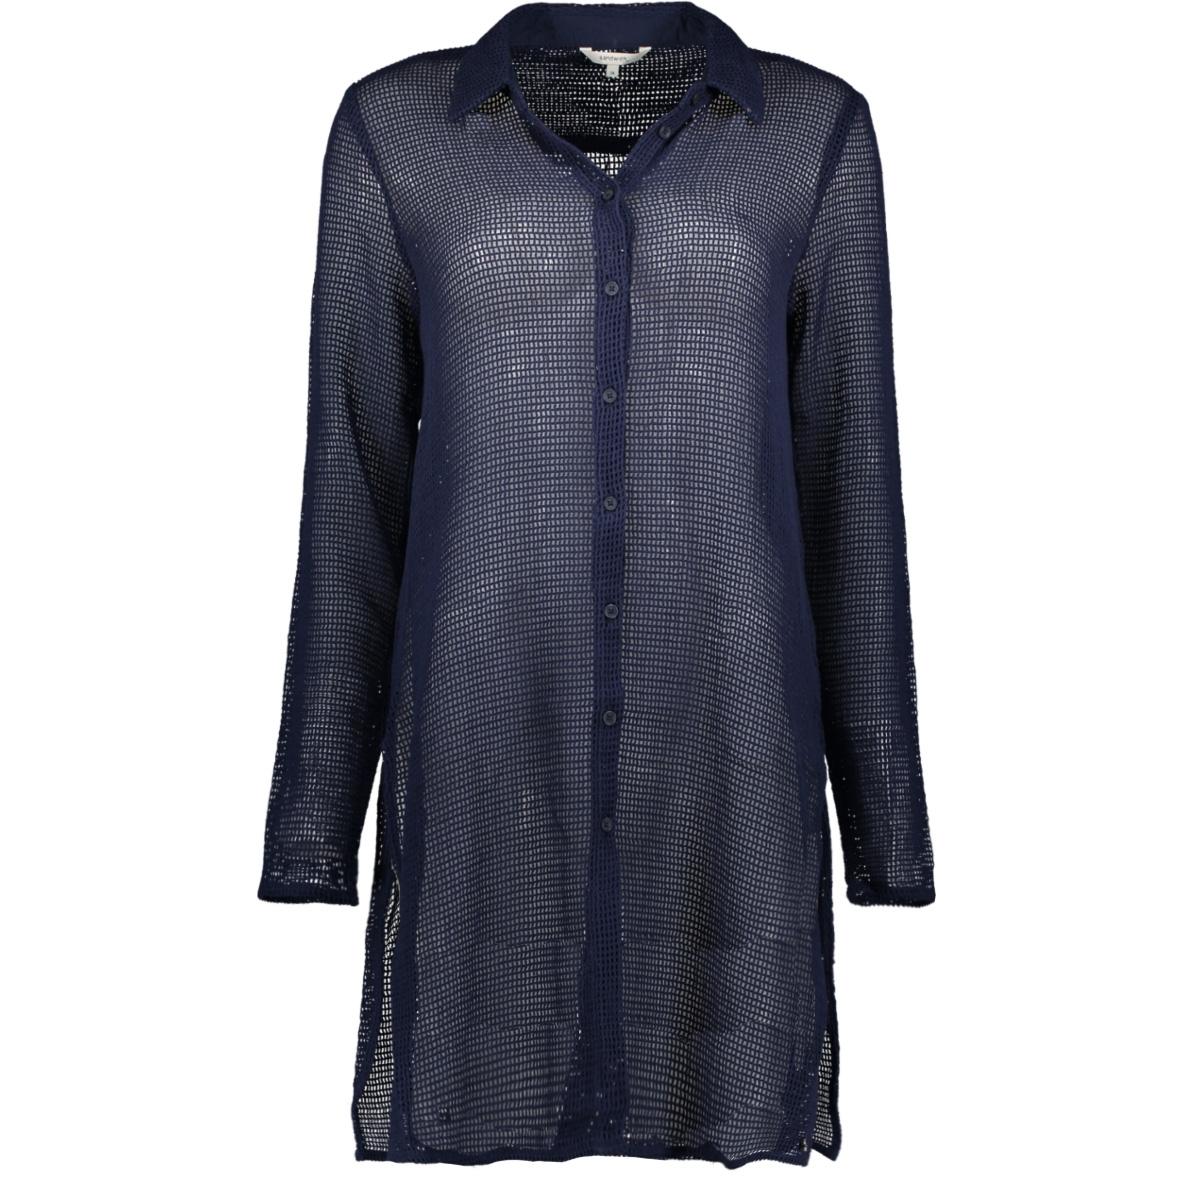 knitwear blouse 22001685 sandwich blouse 40115